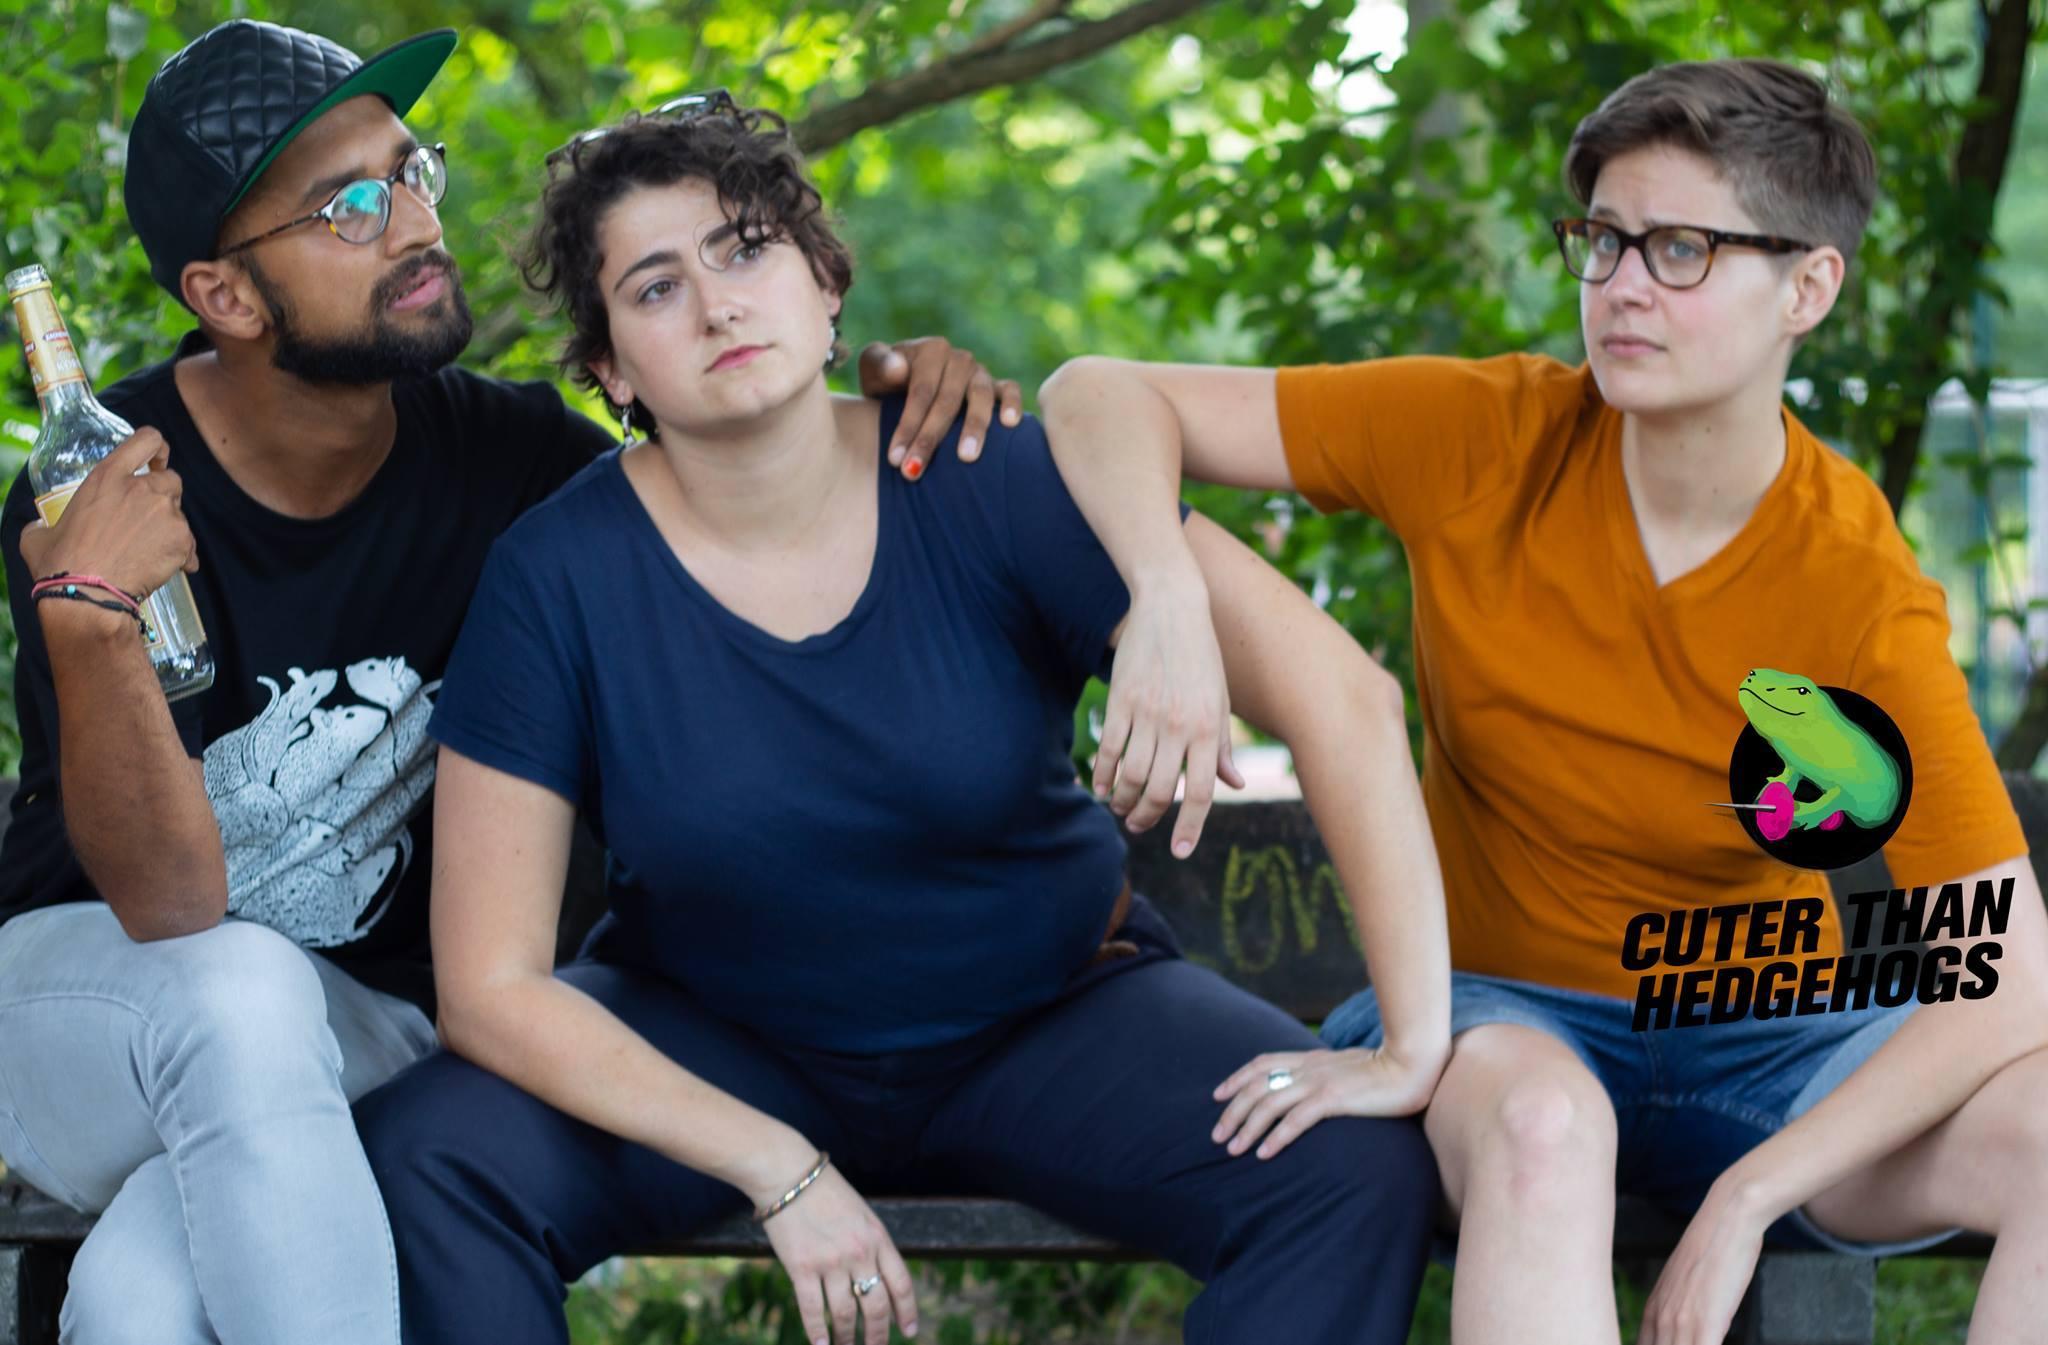 The Hedge - An Improv Comedy Showcase